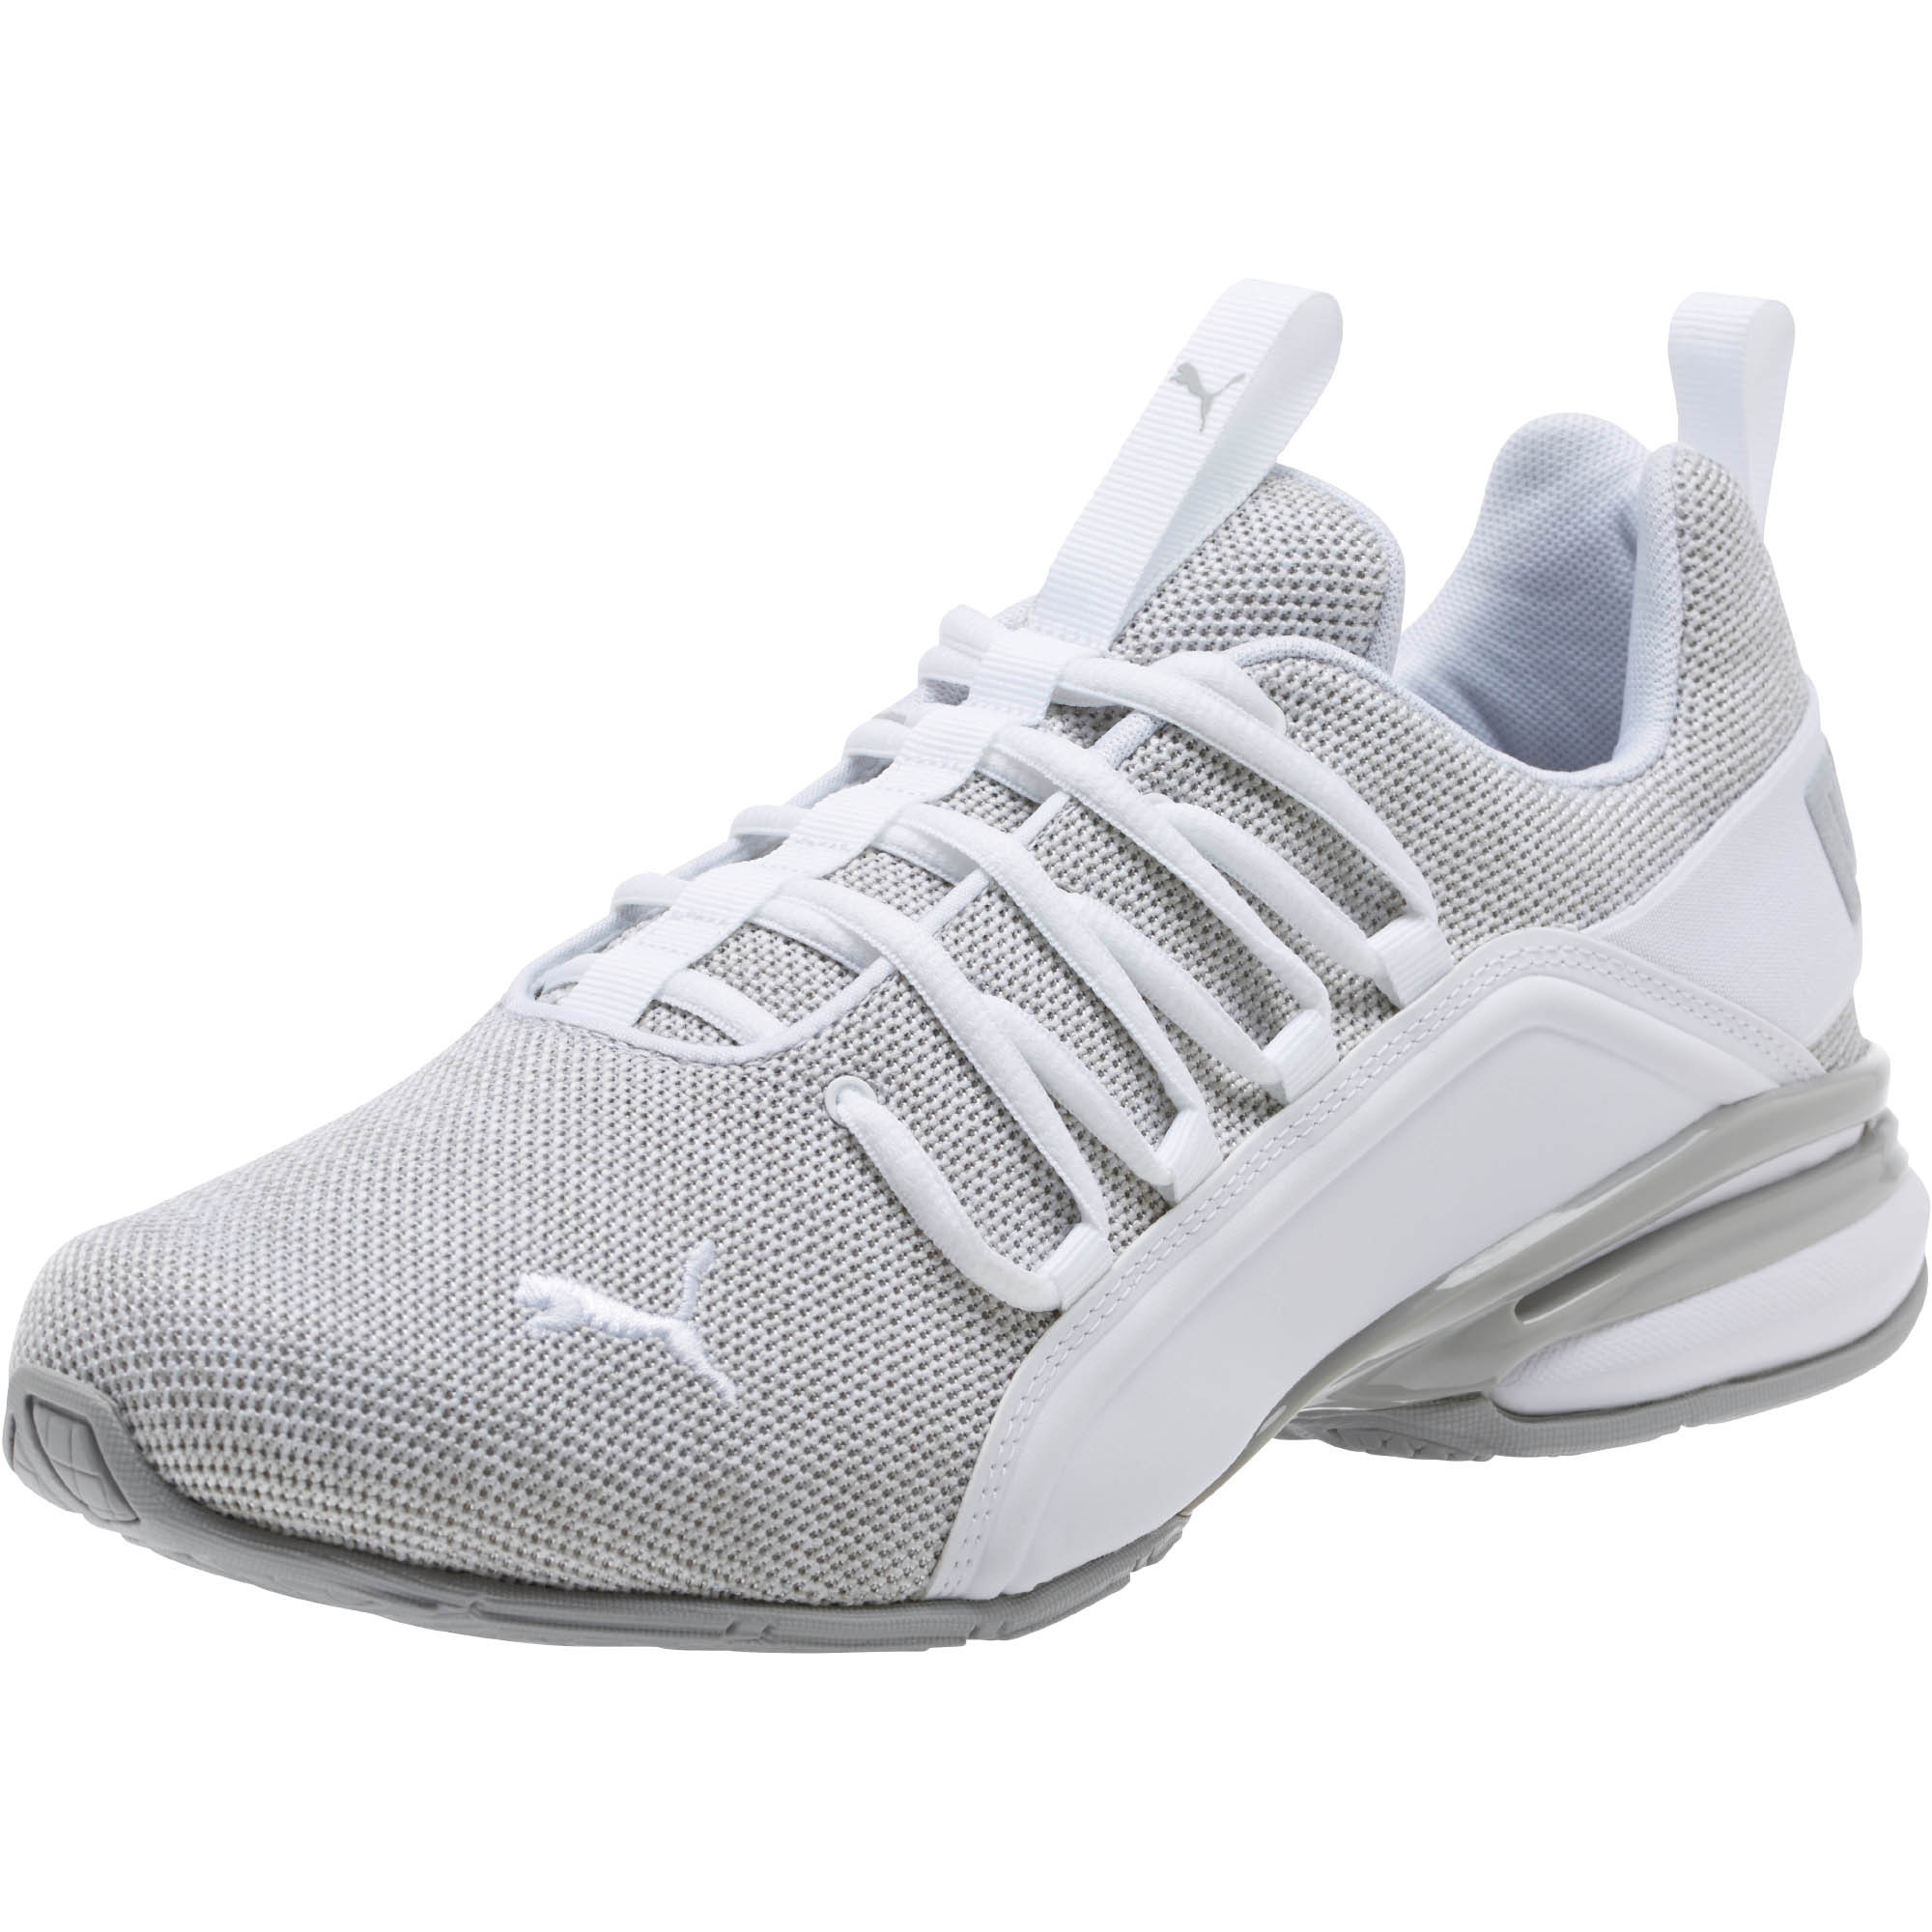 PUMA-Axelion-Men-039-s-Training-Shoes-Men-Shoe-Running thumbnail 14